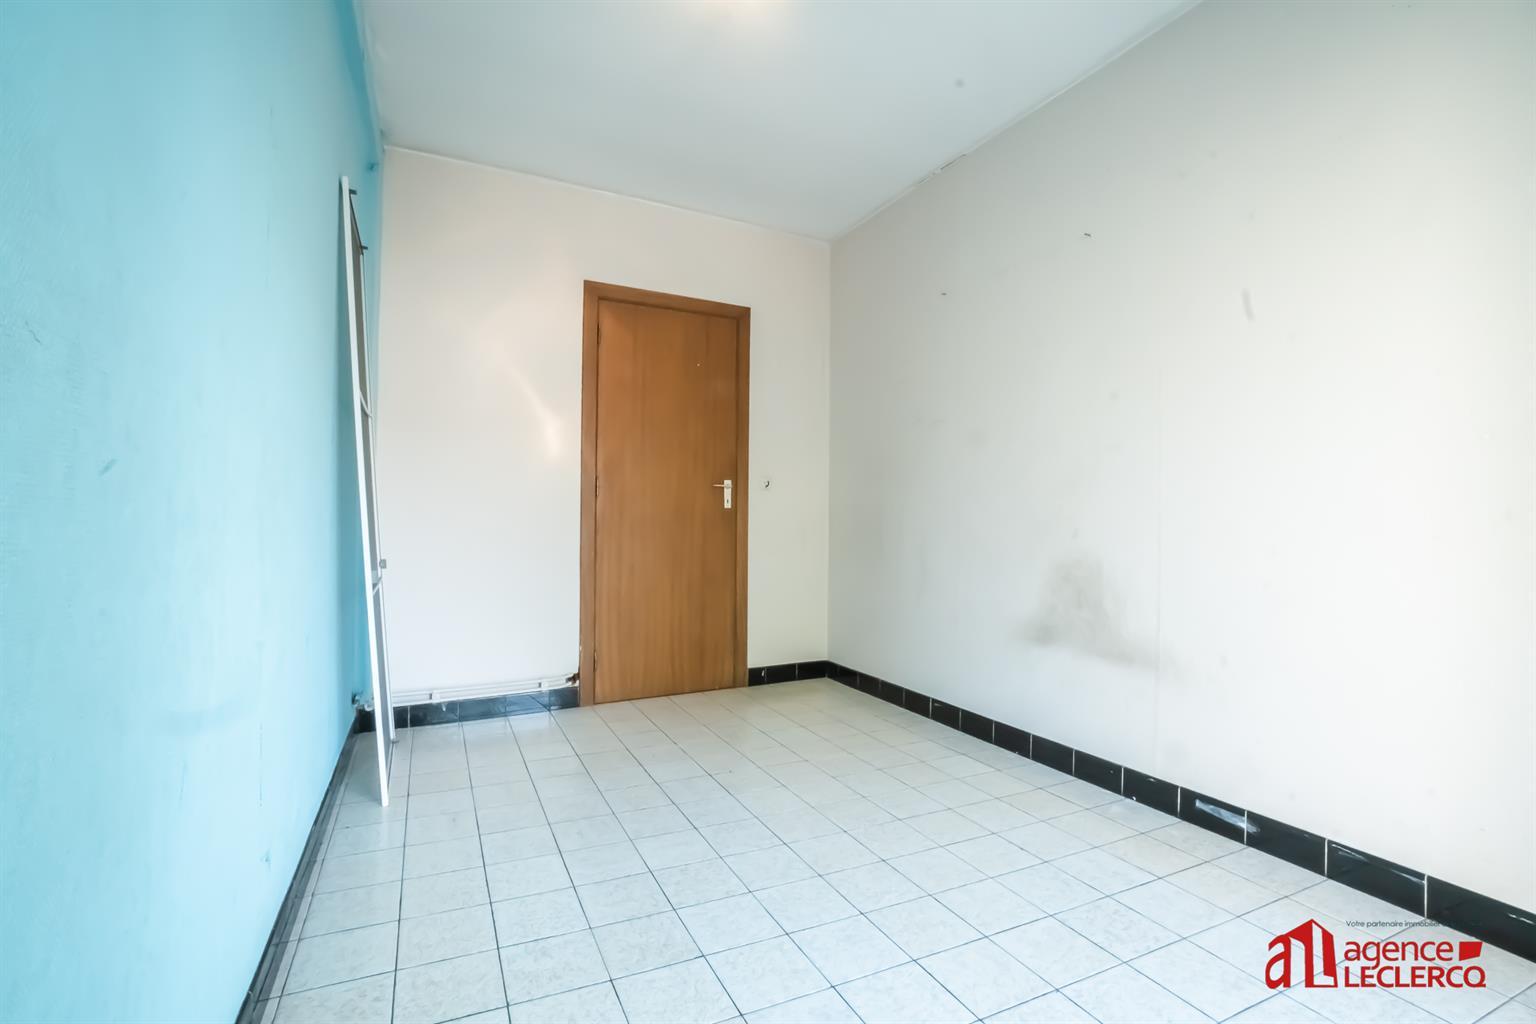 Appartement - Tournai - #4443622-11